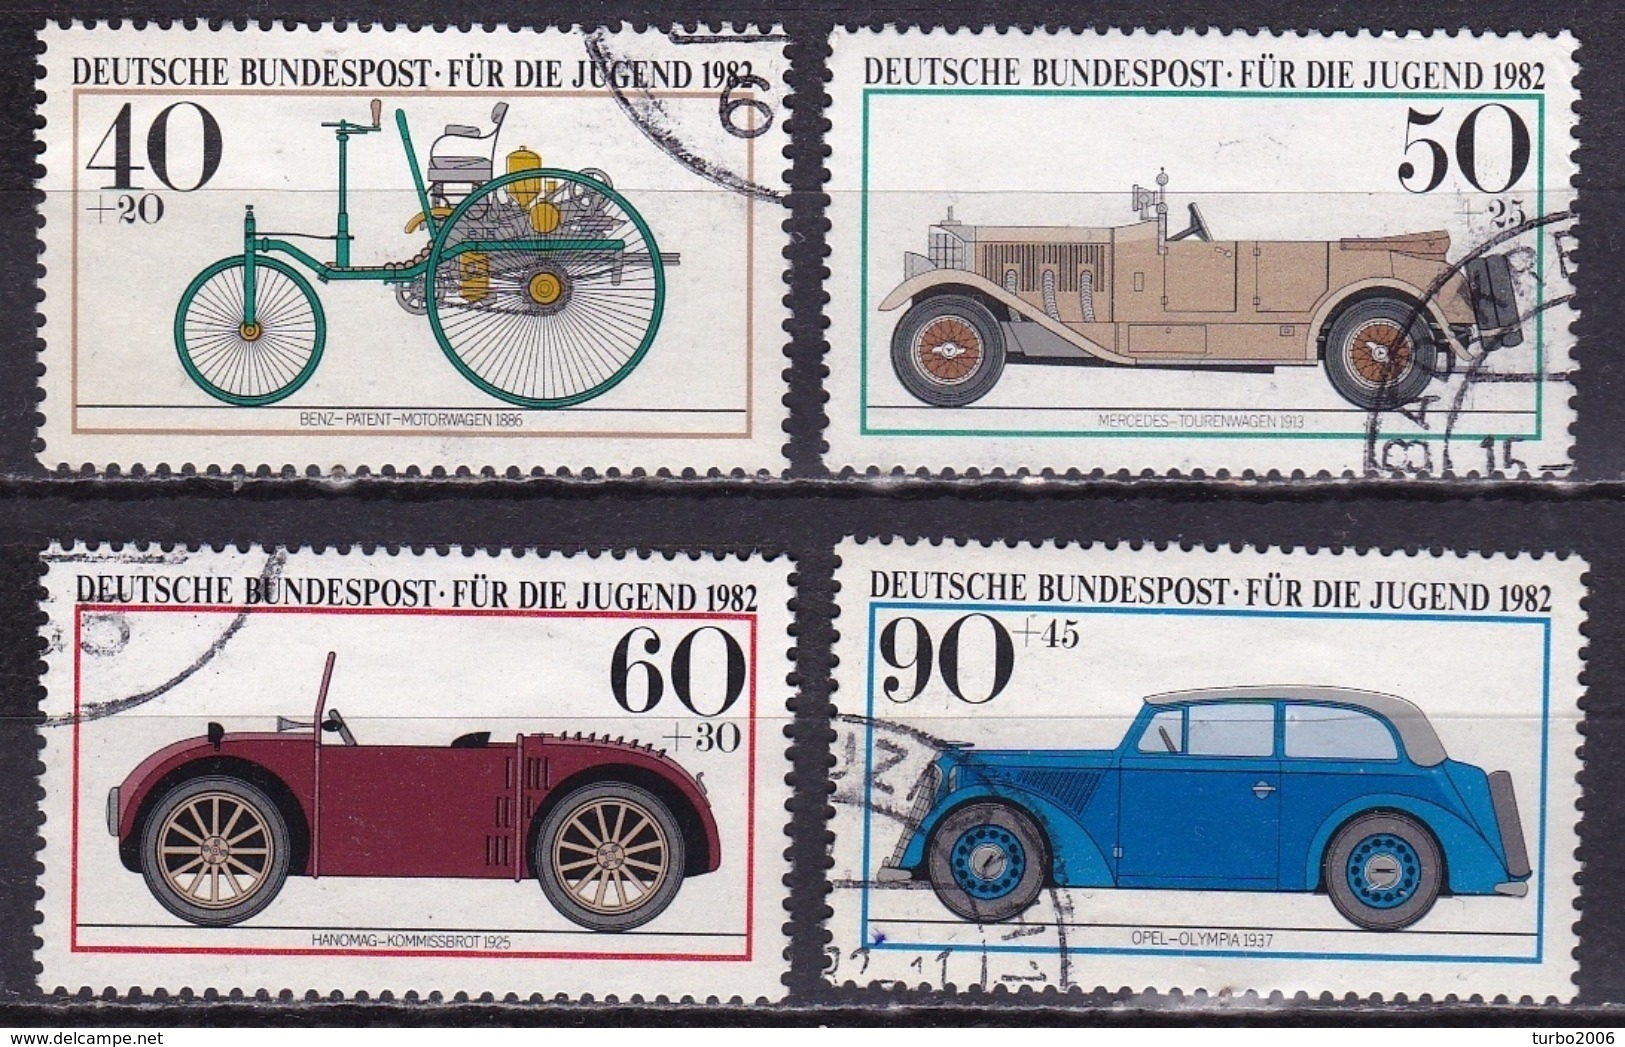 BRD 1982 Jugend Historische Kraftfahrzeuge Kompletter Satz Michel 1123 / 1126 - [7] West-Duitsland